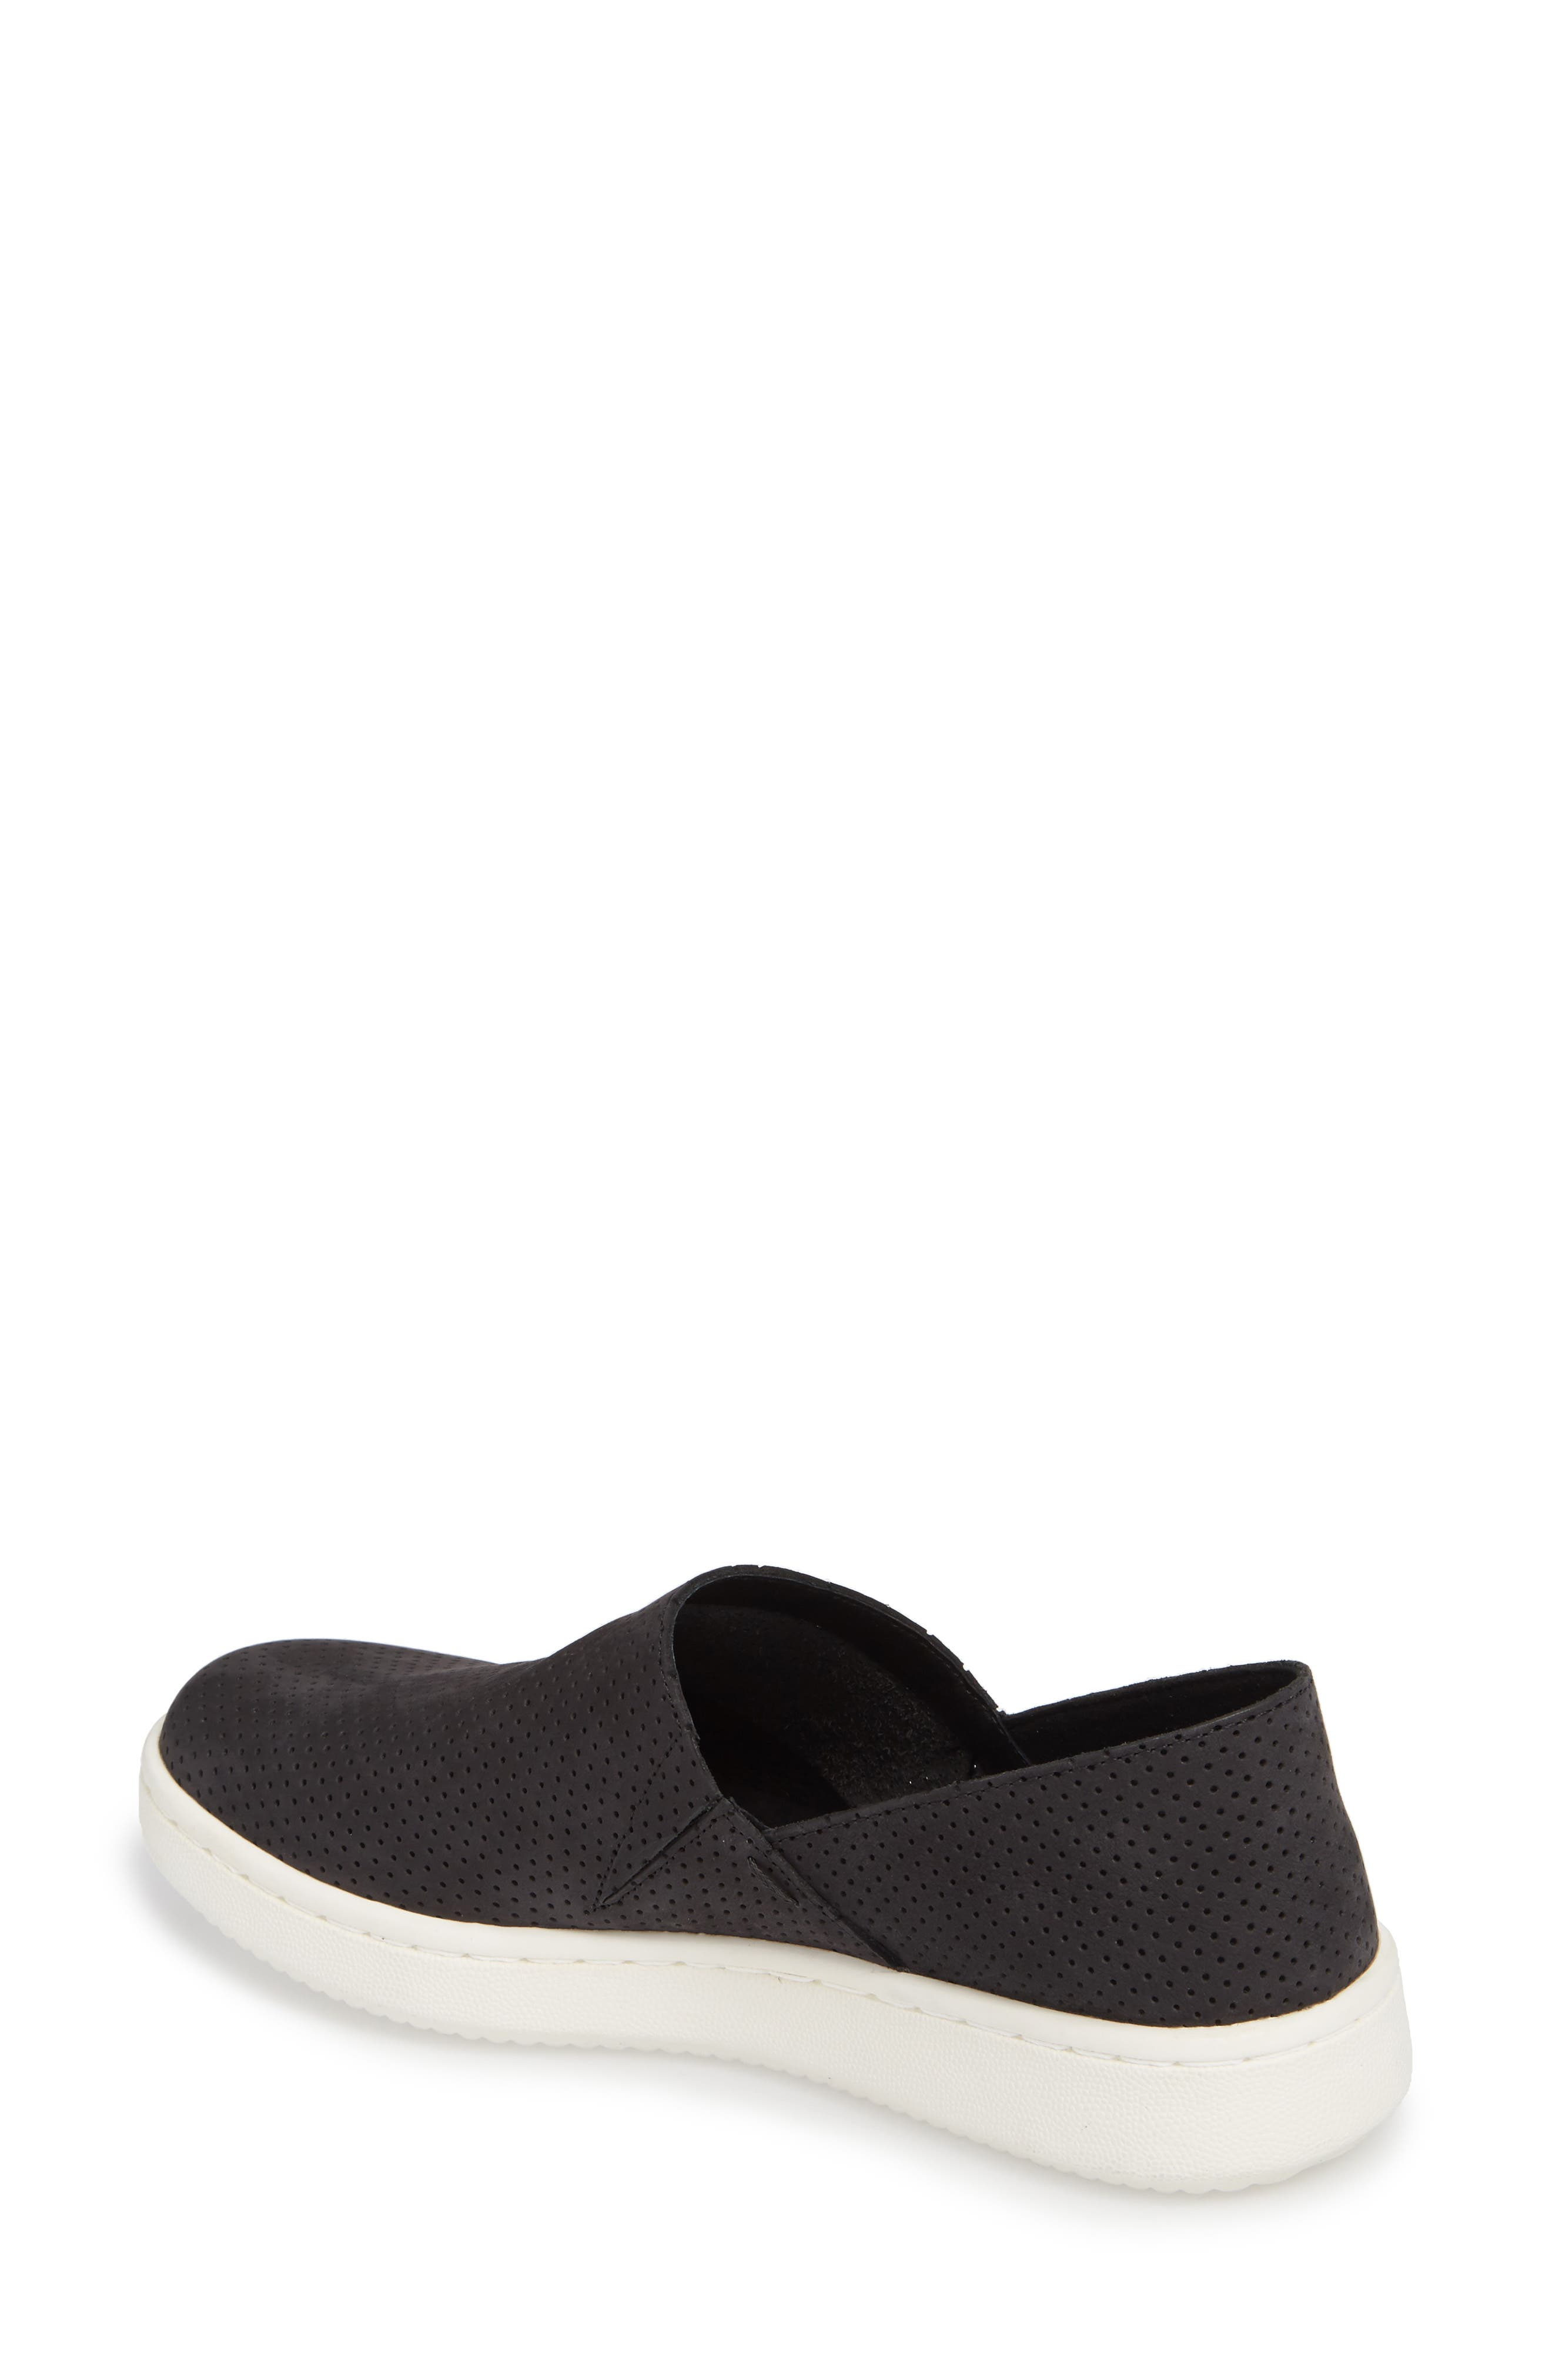 Panda Perforated Slip-On Sneaker,                             Alternate thumbnail 2, color,                             001